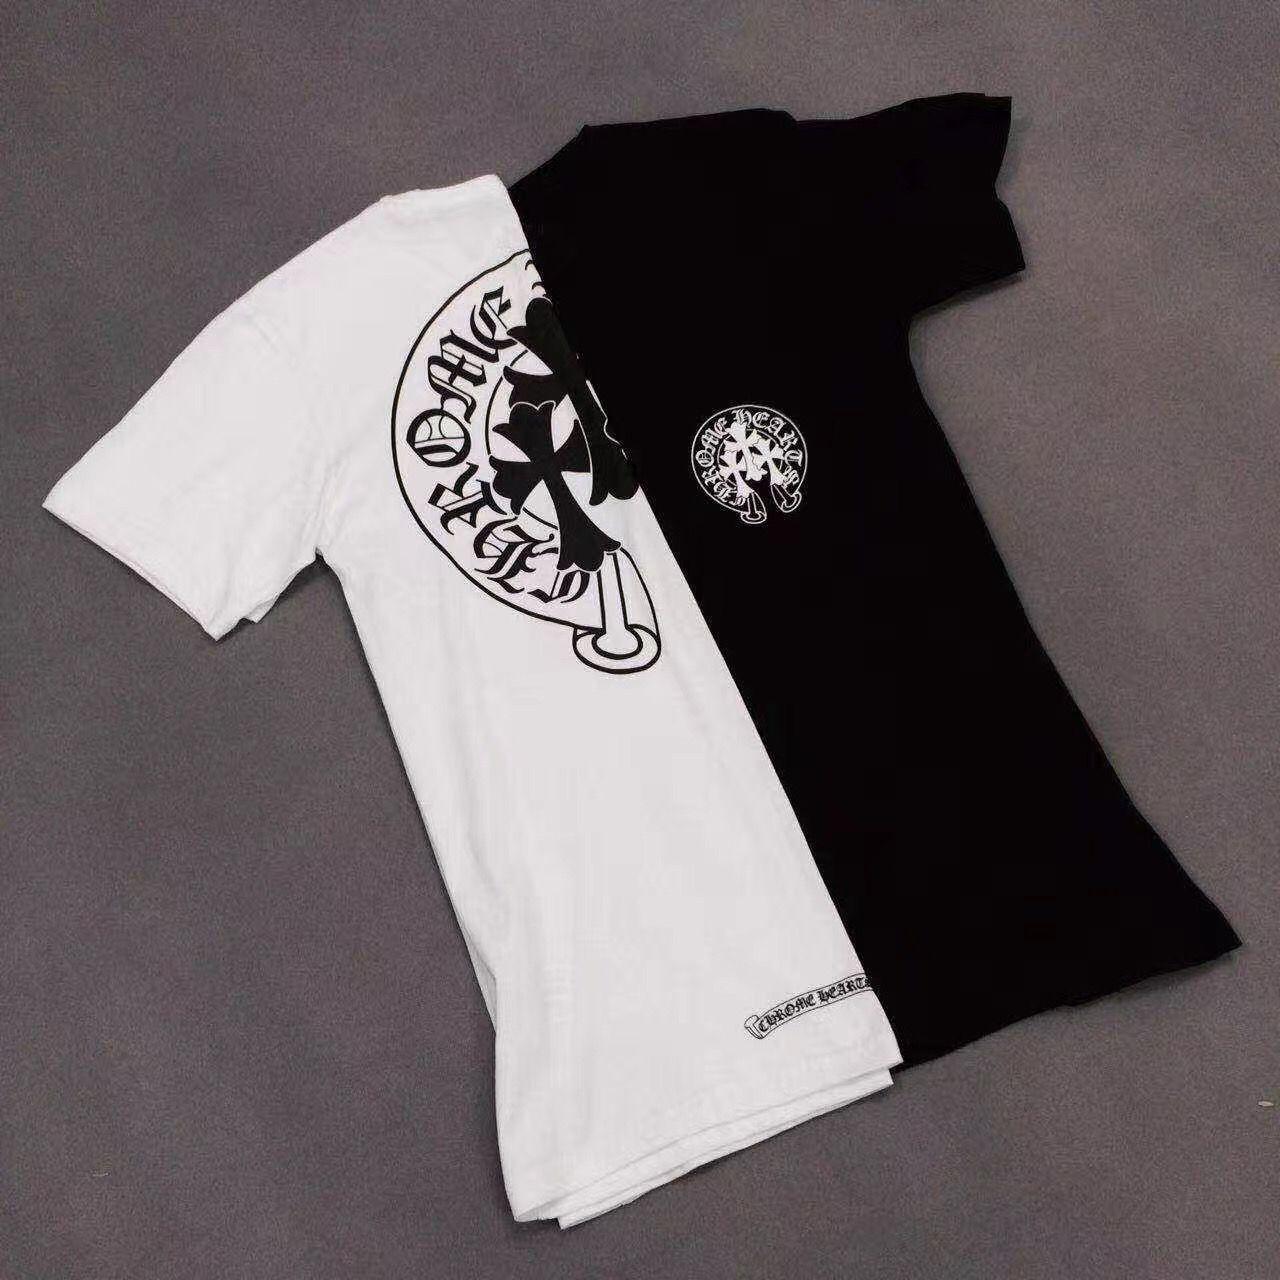 49 Sale Chrome Hearts Tshirt Unisex Latest Chrome Hearts T Shirt Design Black And White Available S Chrome Hearts Shirt Chrome Hearts Tshirt Designs